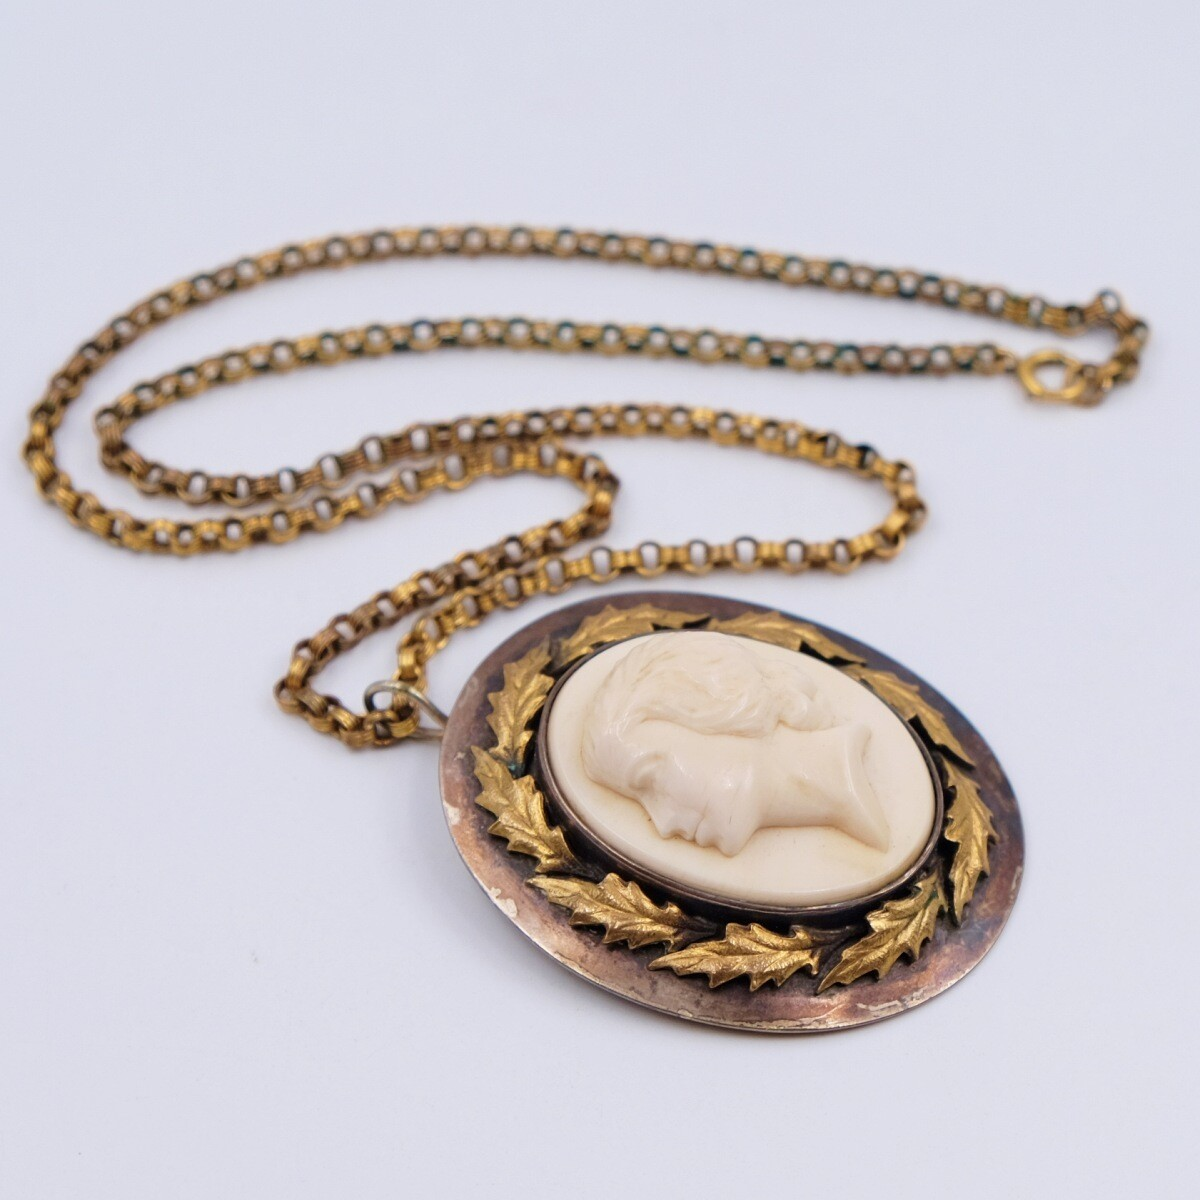 Antique Cameo Long Necklace 1910